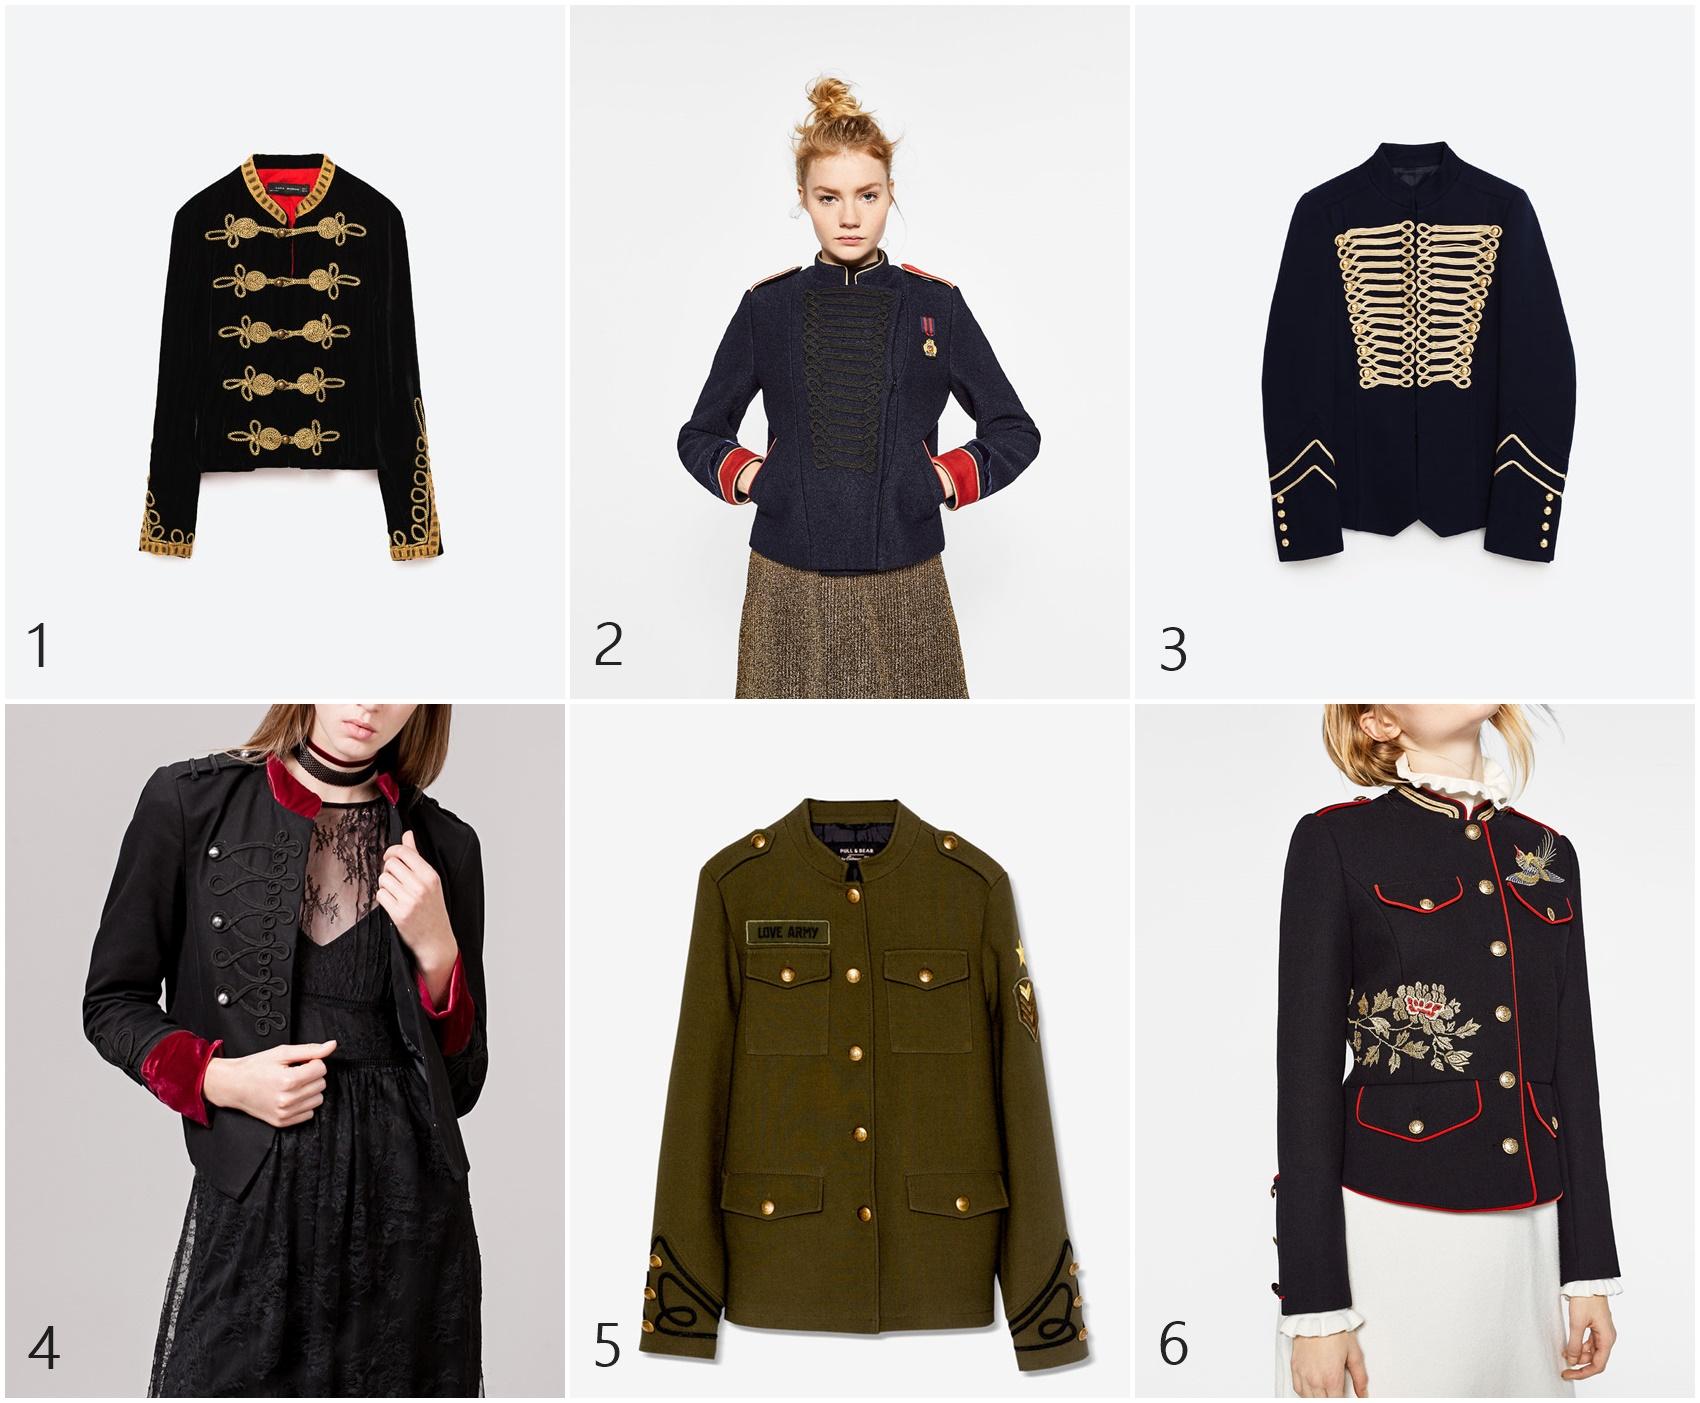 trend-alert-chaquetas-bordadas-militares